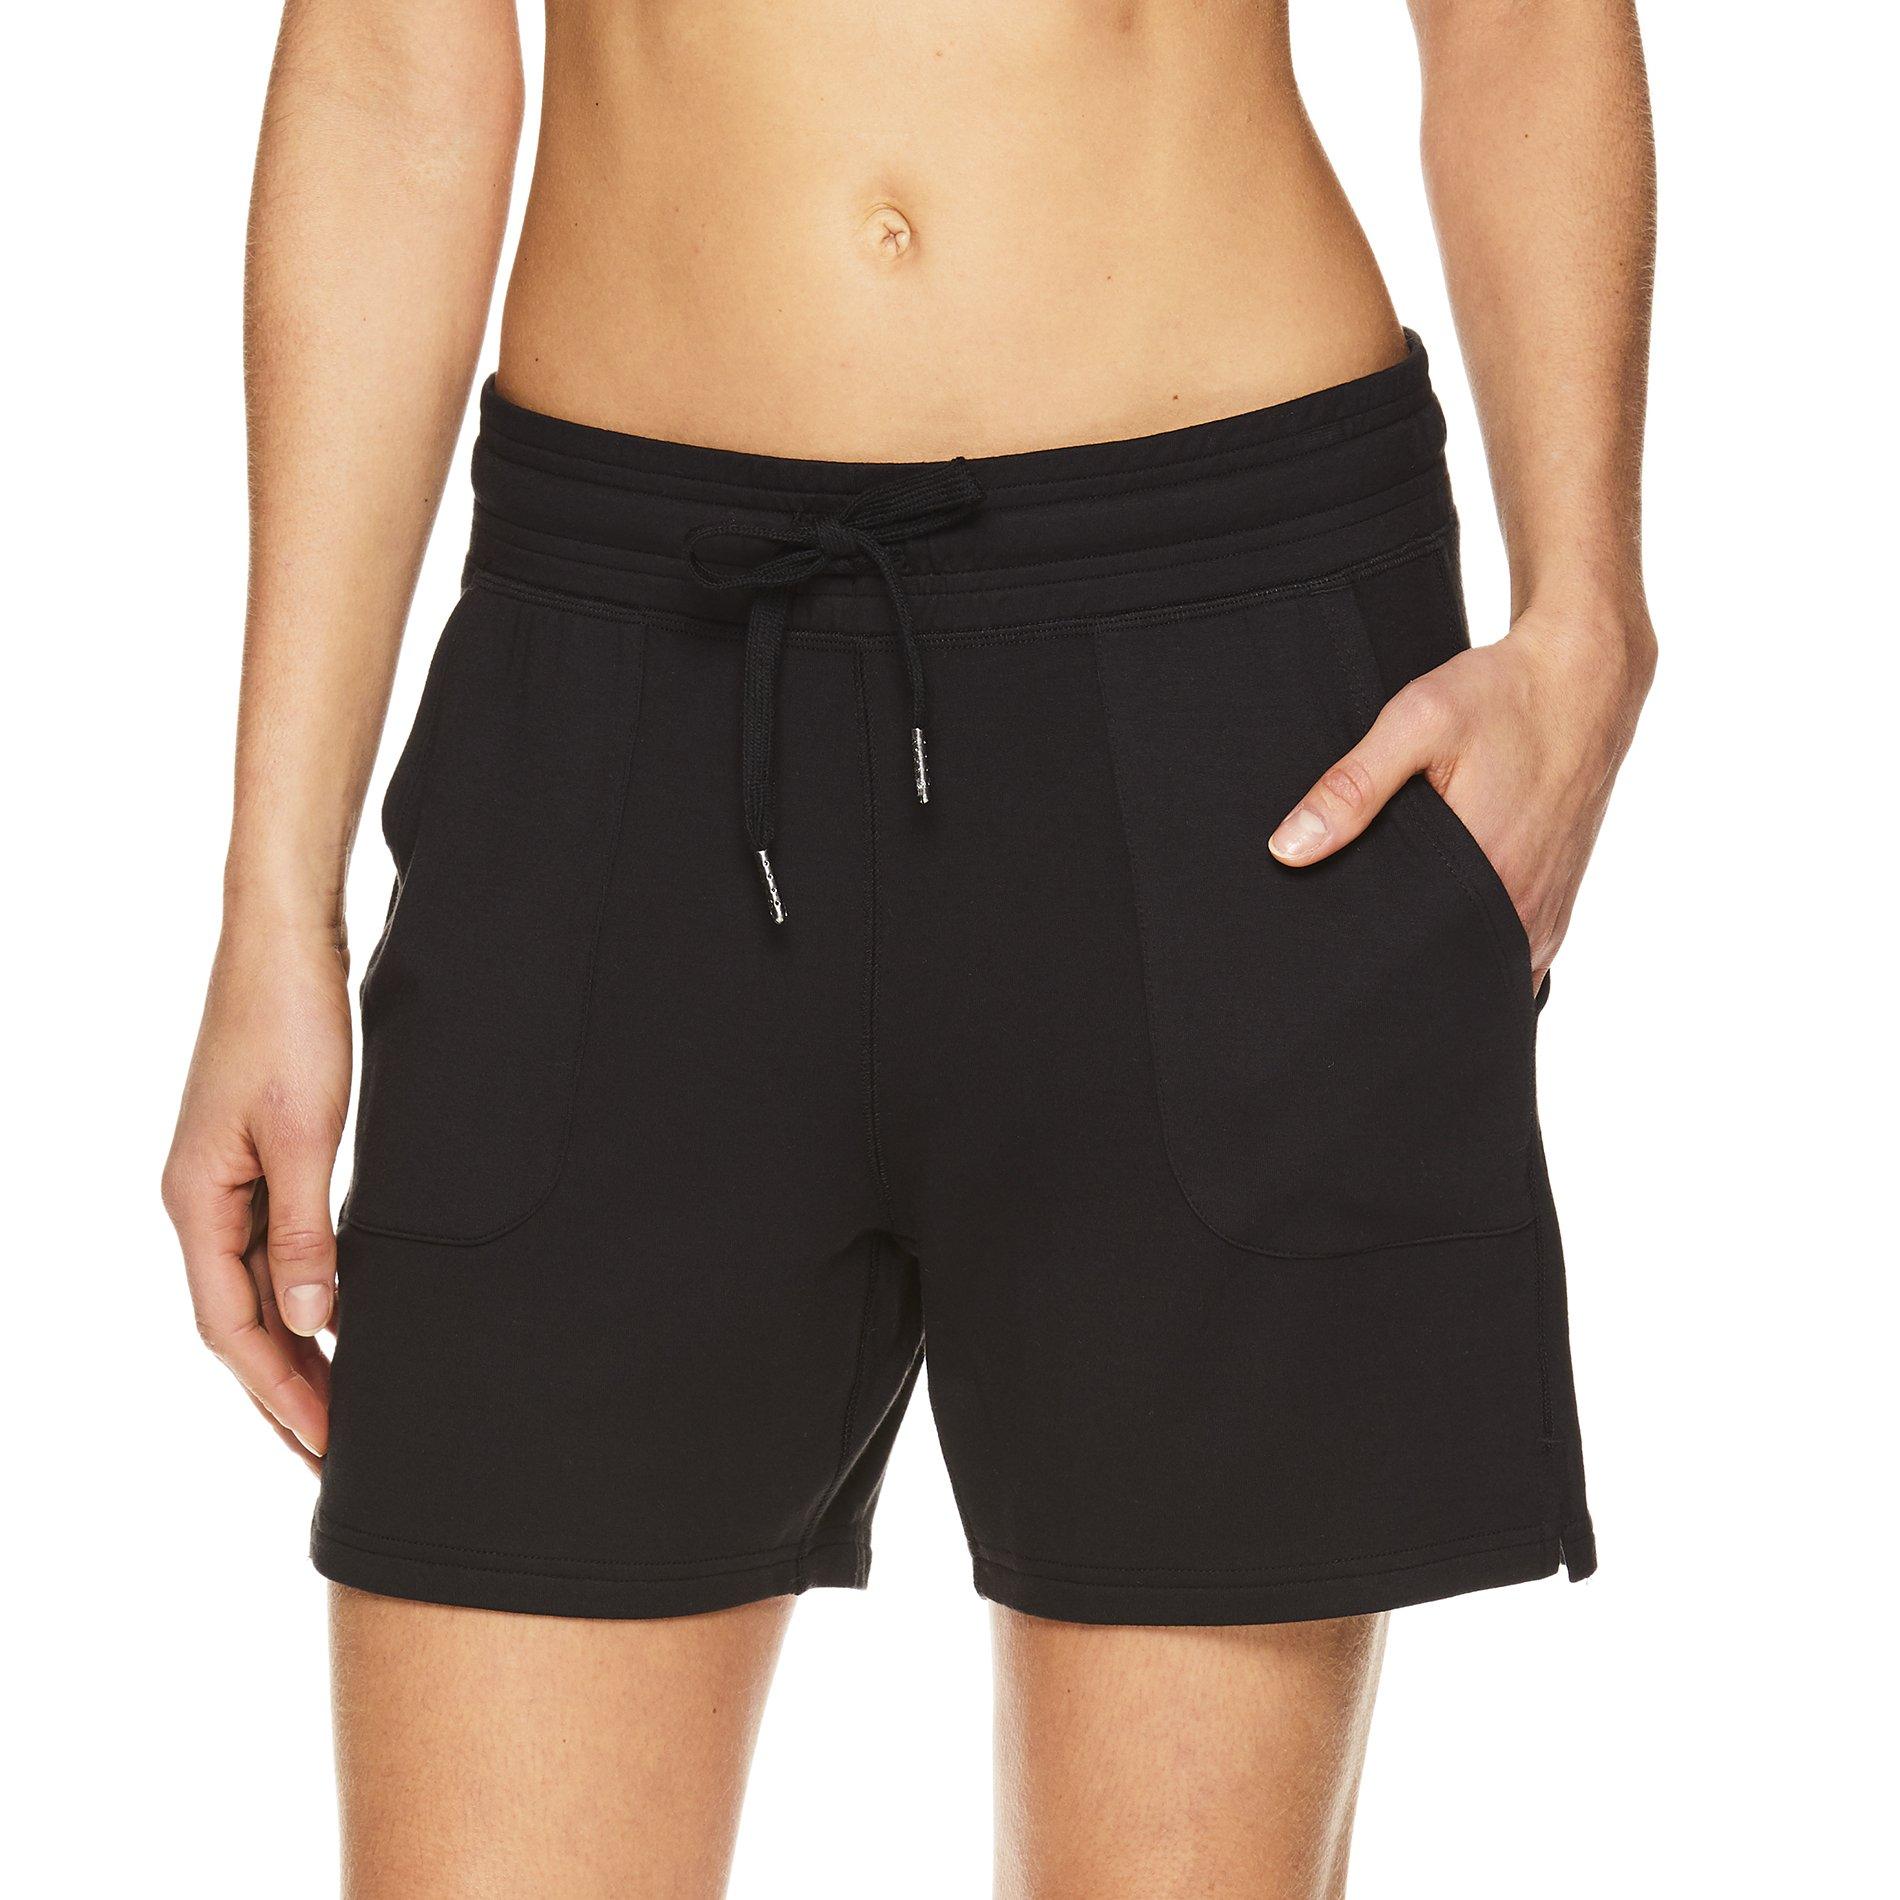 Gaiam Women's Warrior Yoga Short - Bike & Running Activewear Shorts w/Pockets - Black (Tap Shoe), 2X